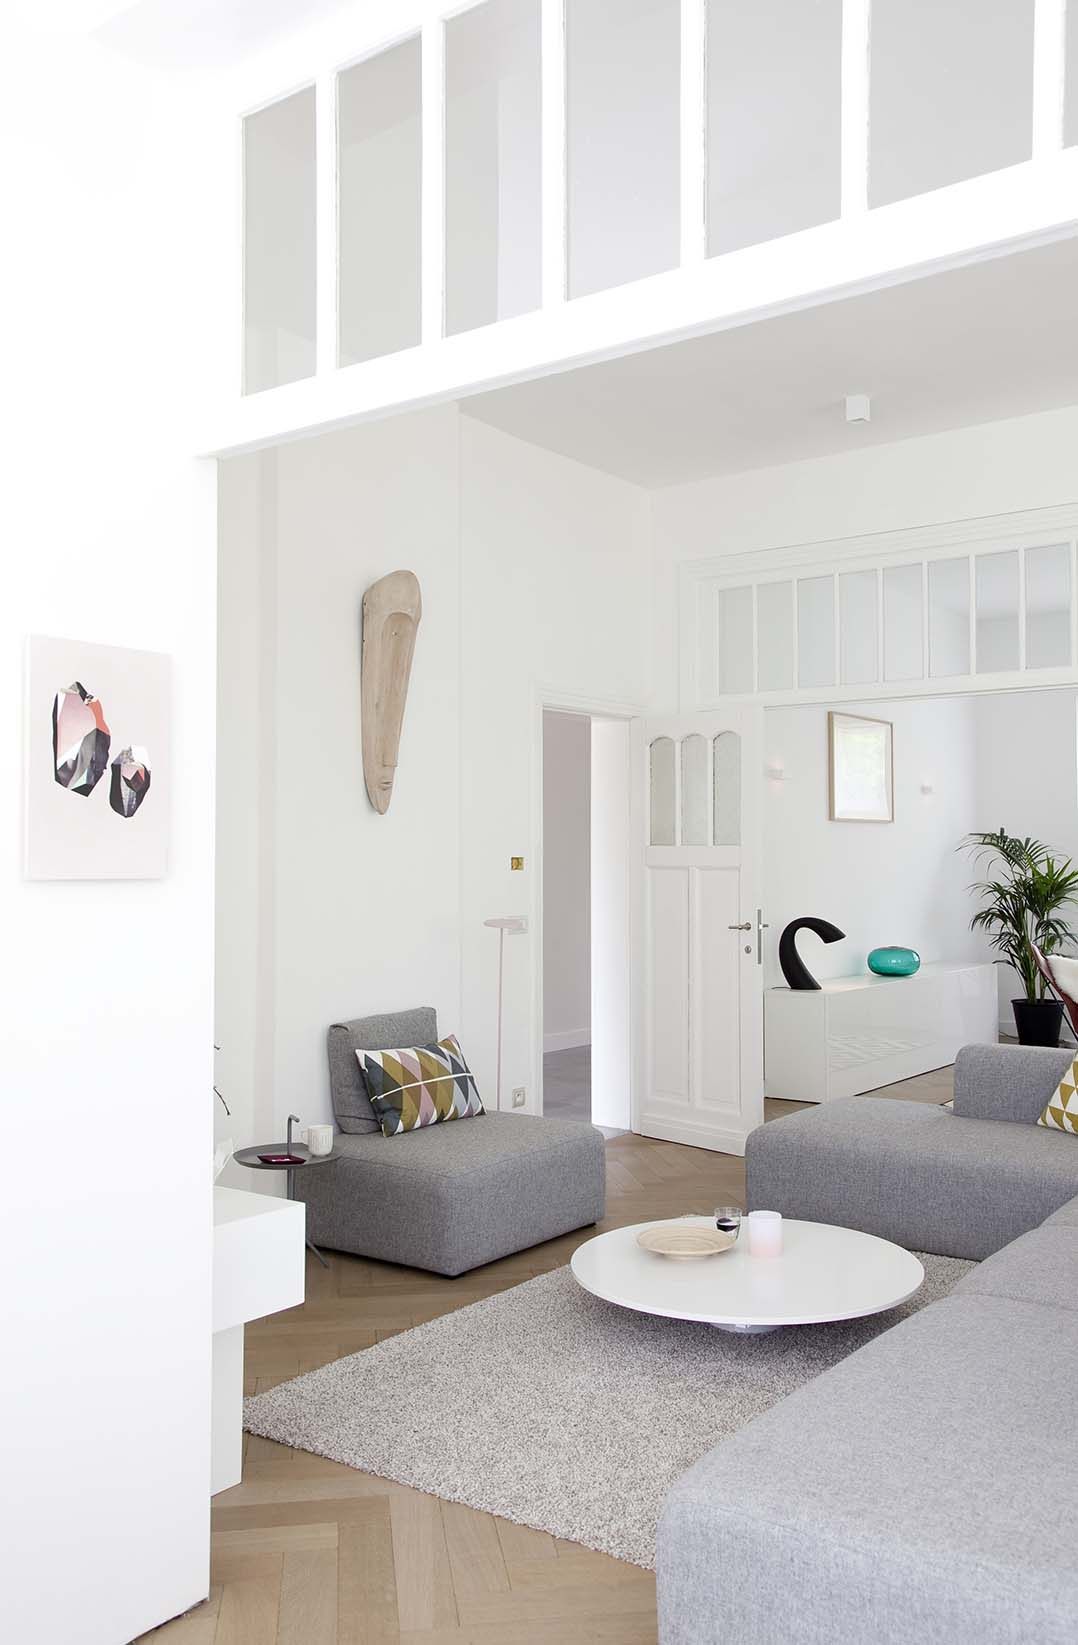 1000+ images about Interieur on Pinterest